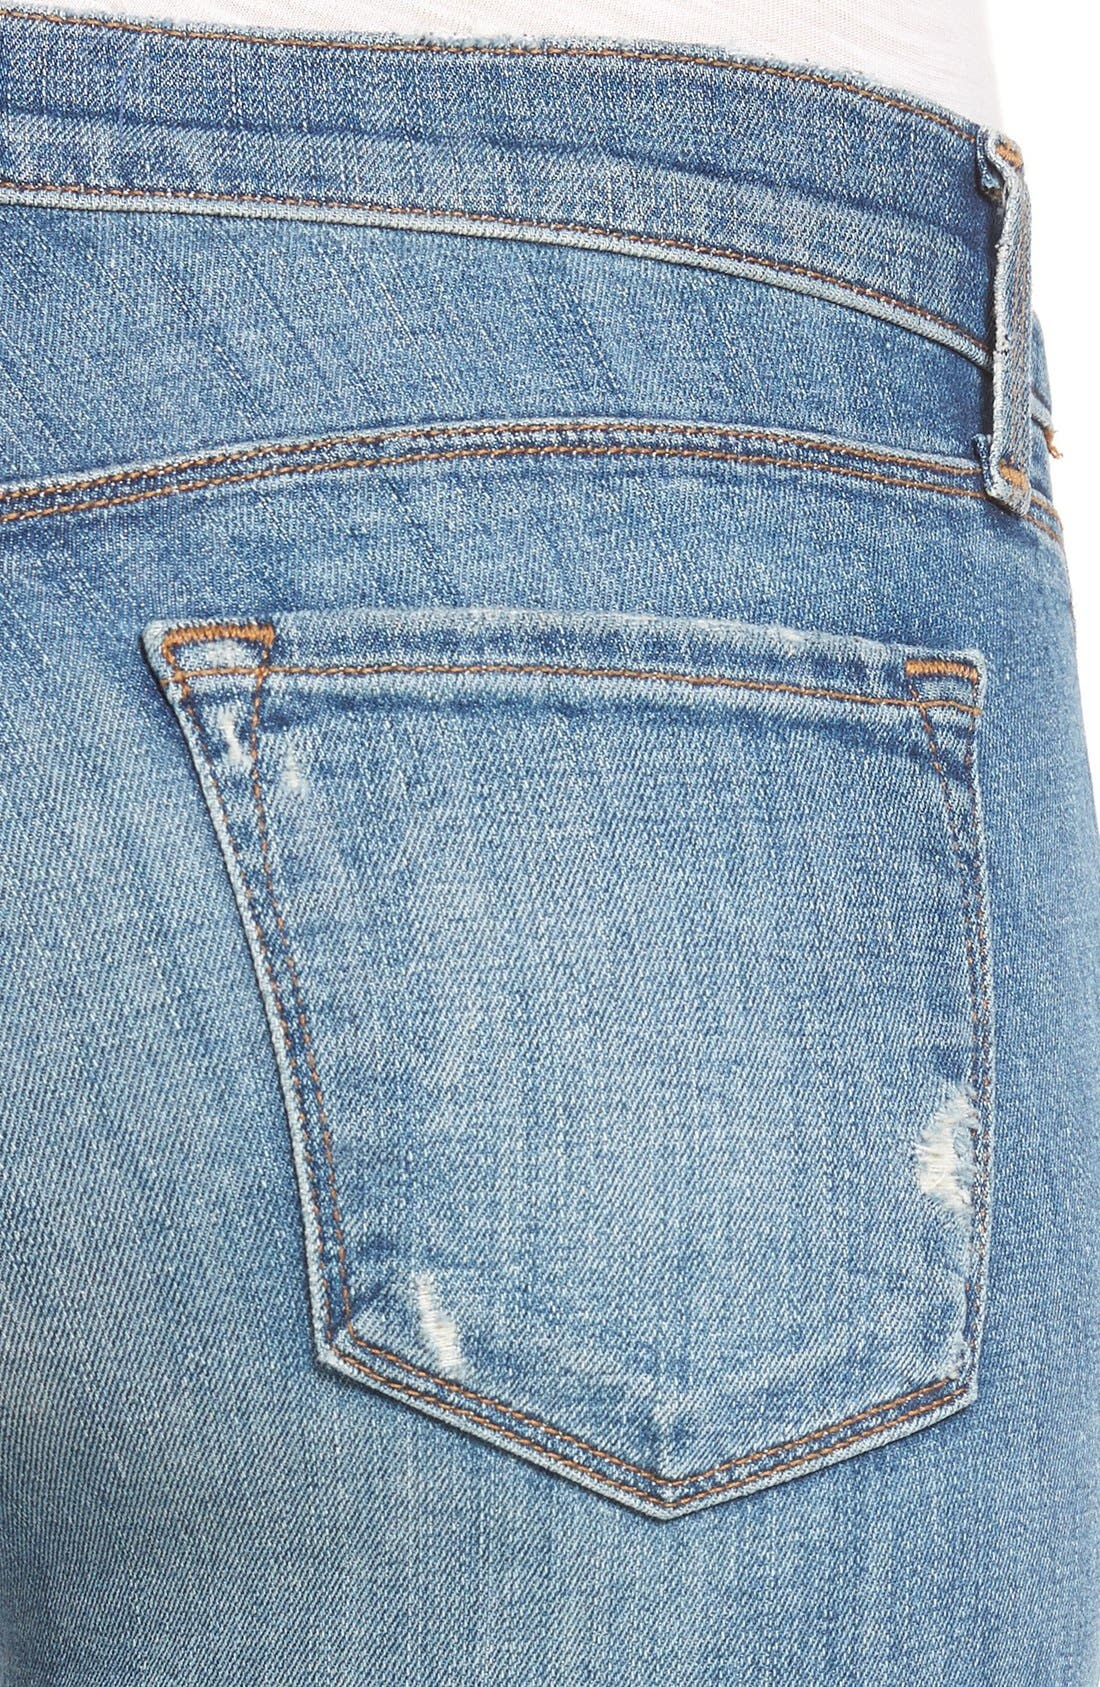 Alternate Image 4  - J Brand Ripped Crop Skinny Jeans (Mischief)